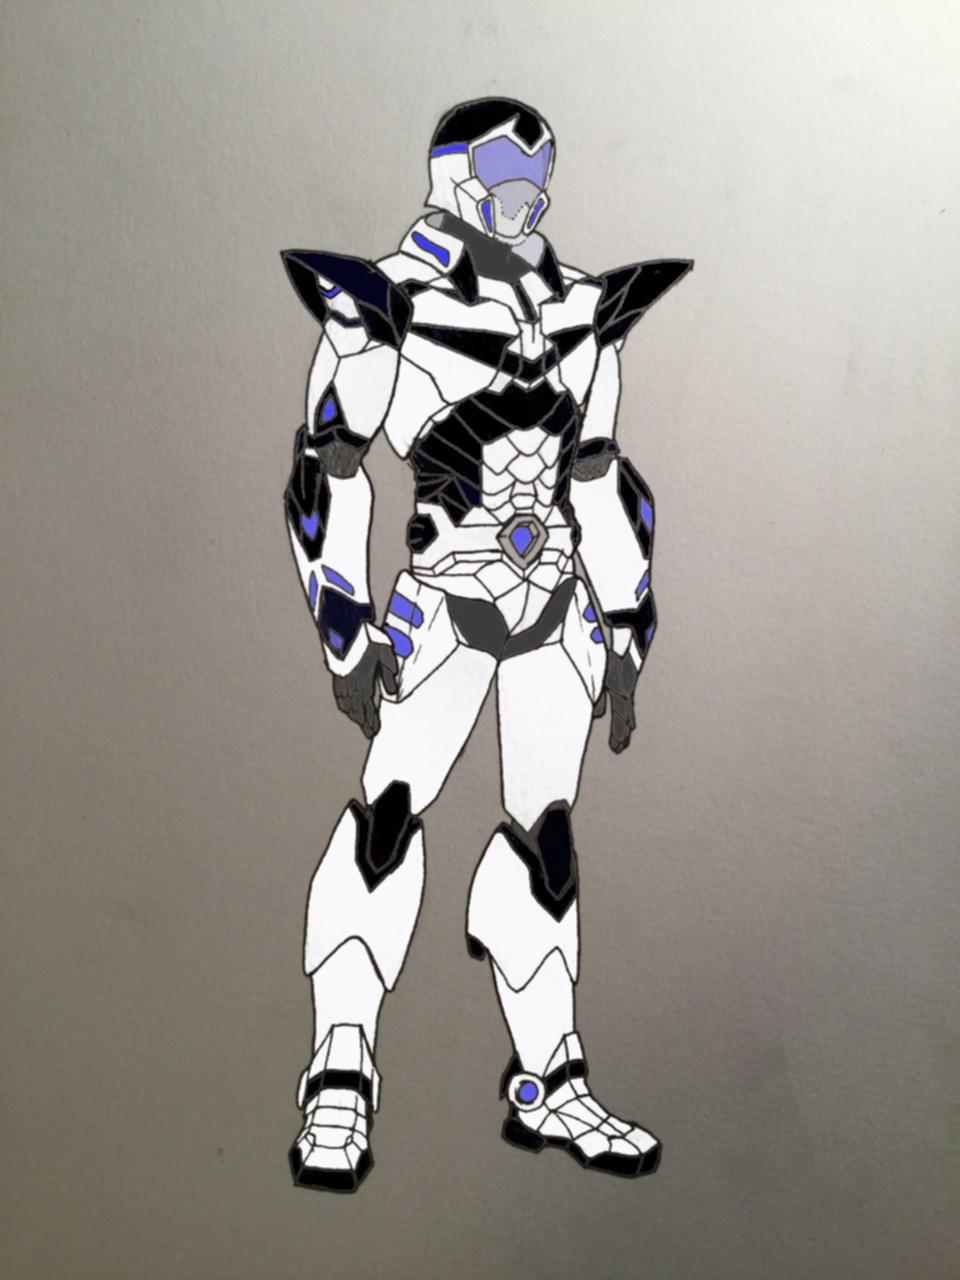 Voltron Paladin Armor Redesign (Flat Colors) by OmniWorldImaginator on DeviantArt